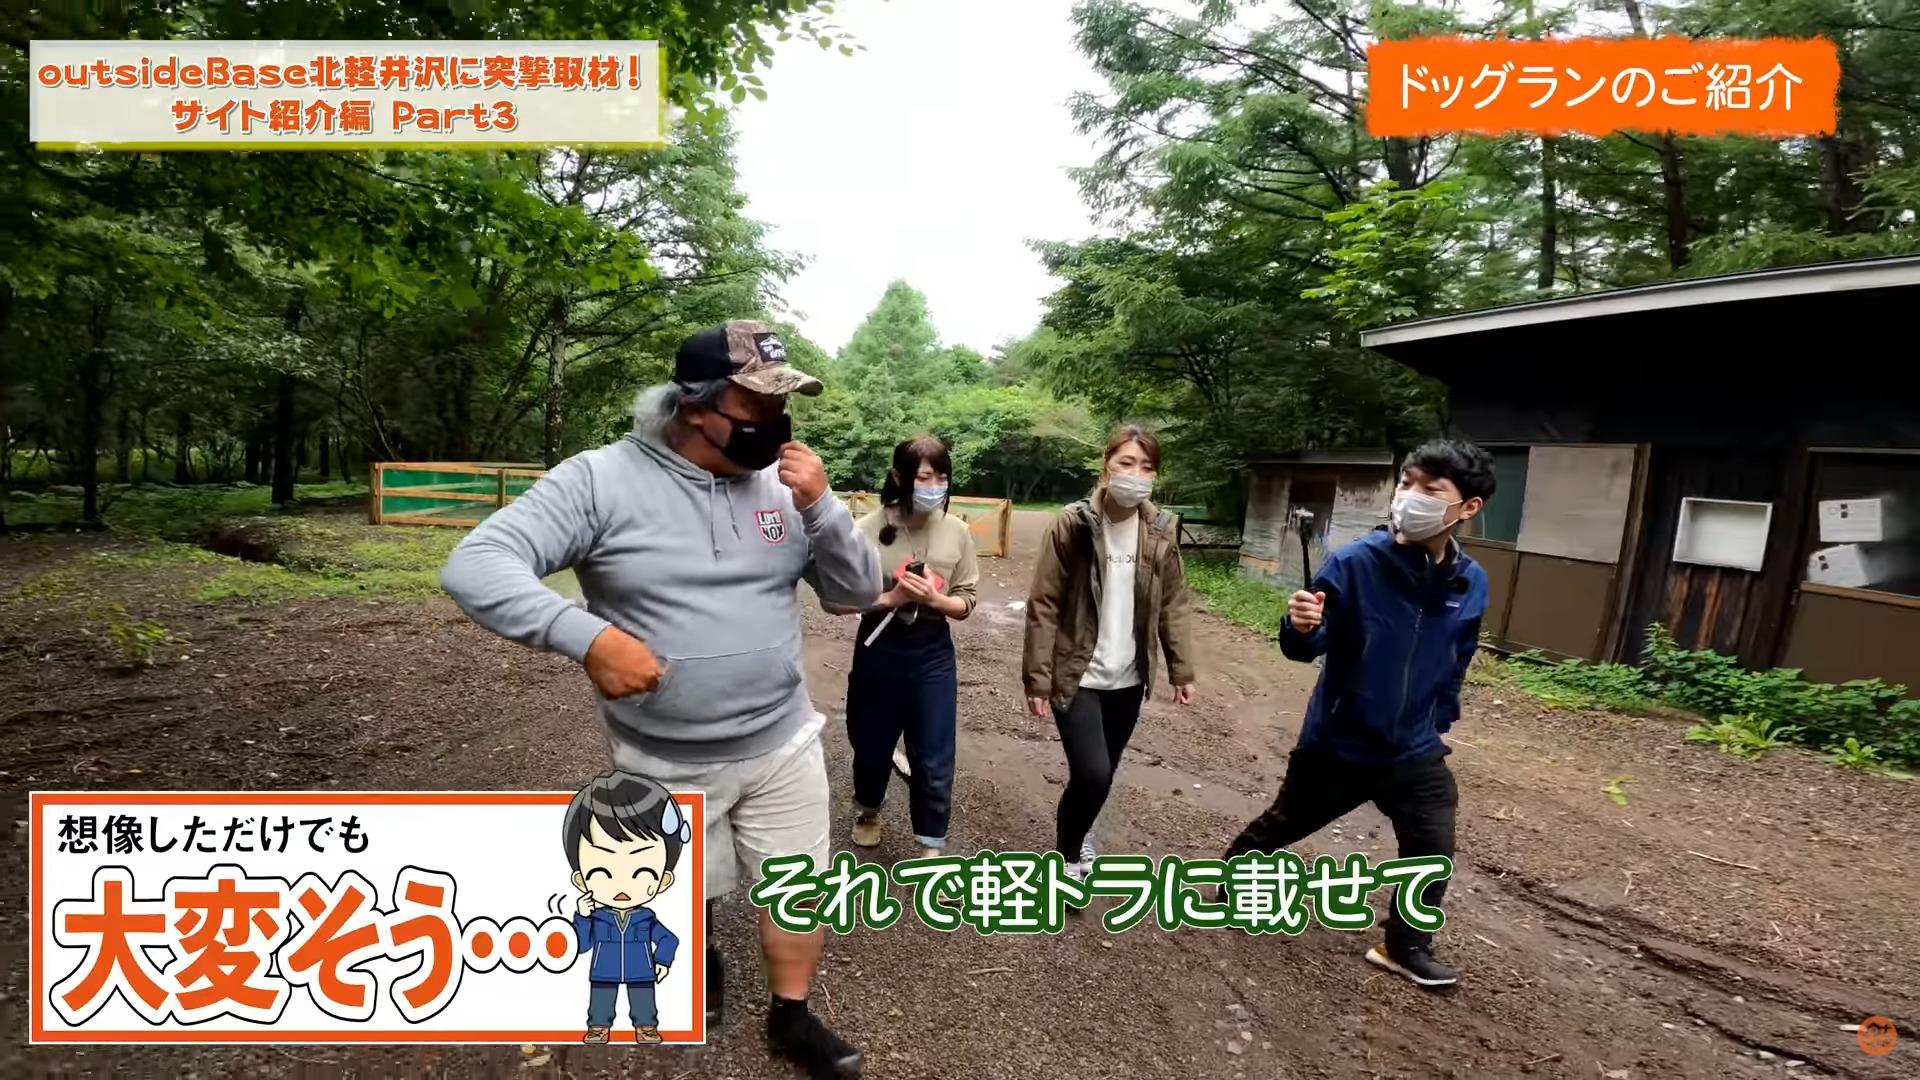 【outsidebase北軽井沢】ドッグラン